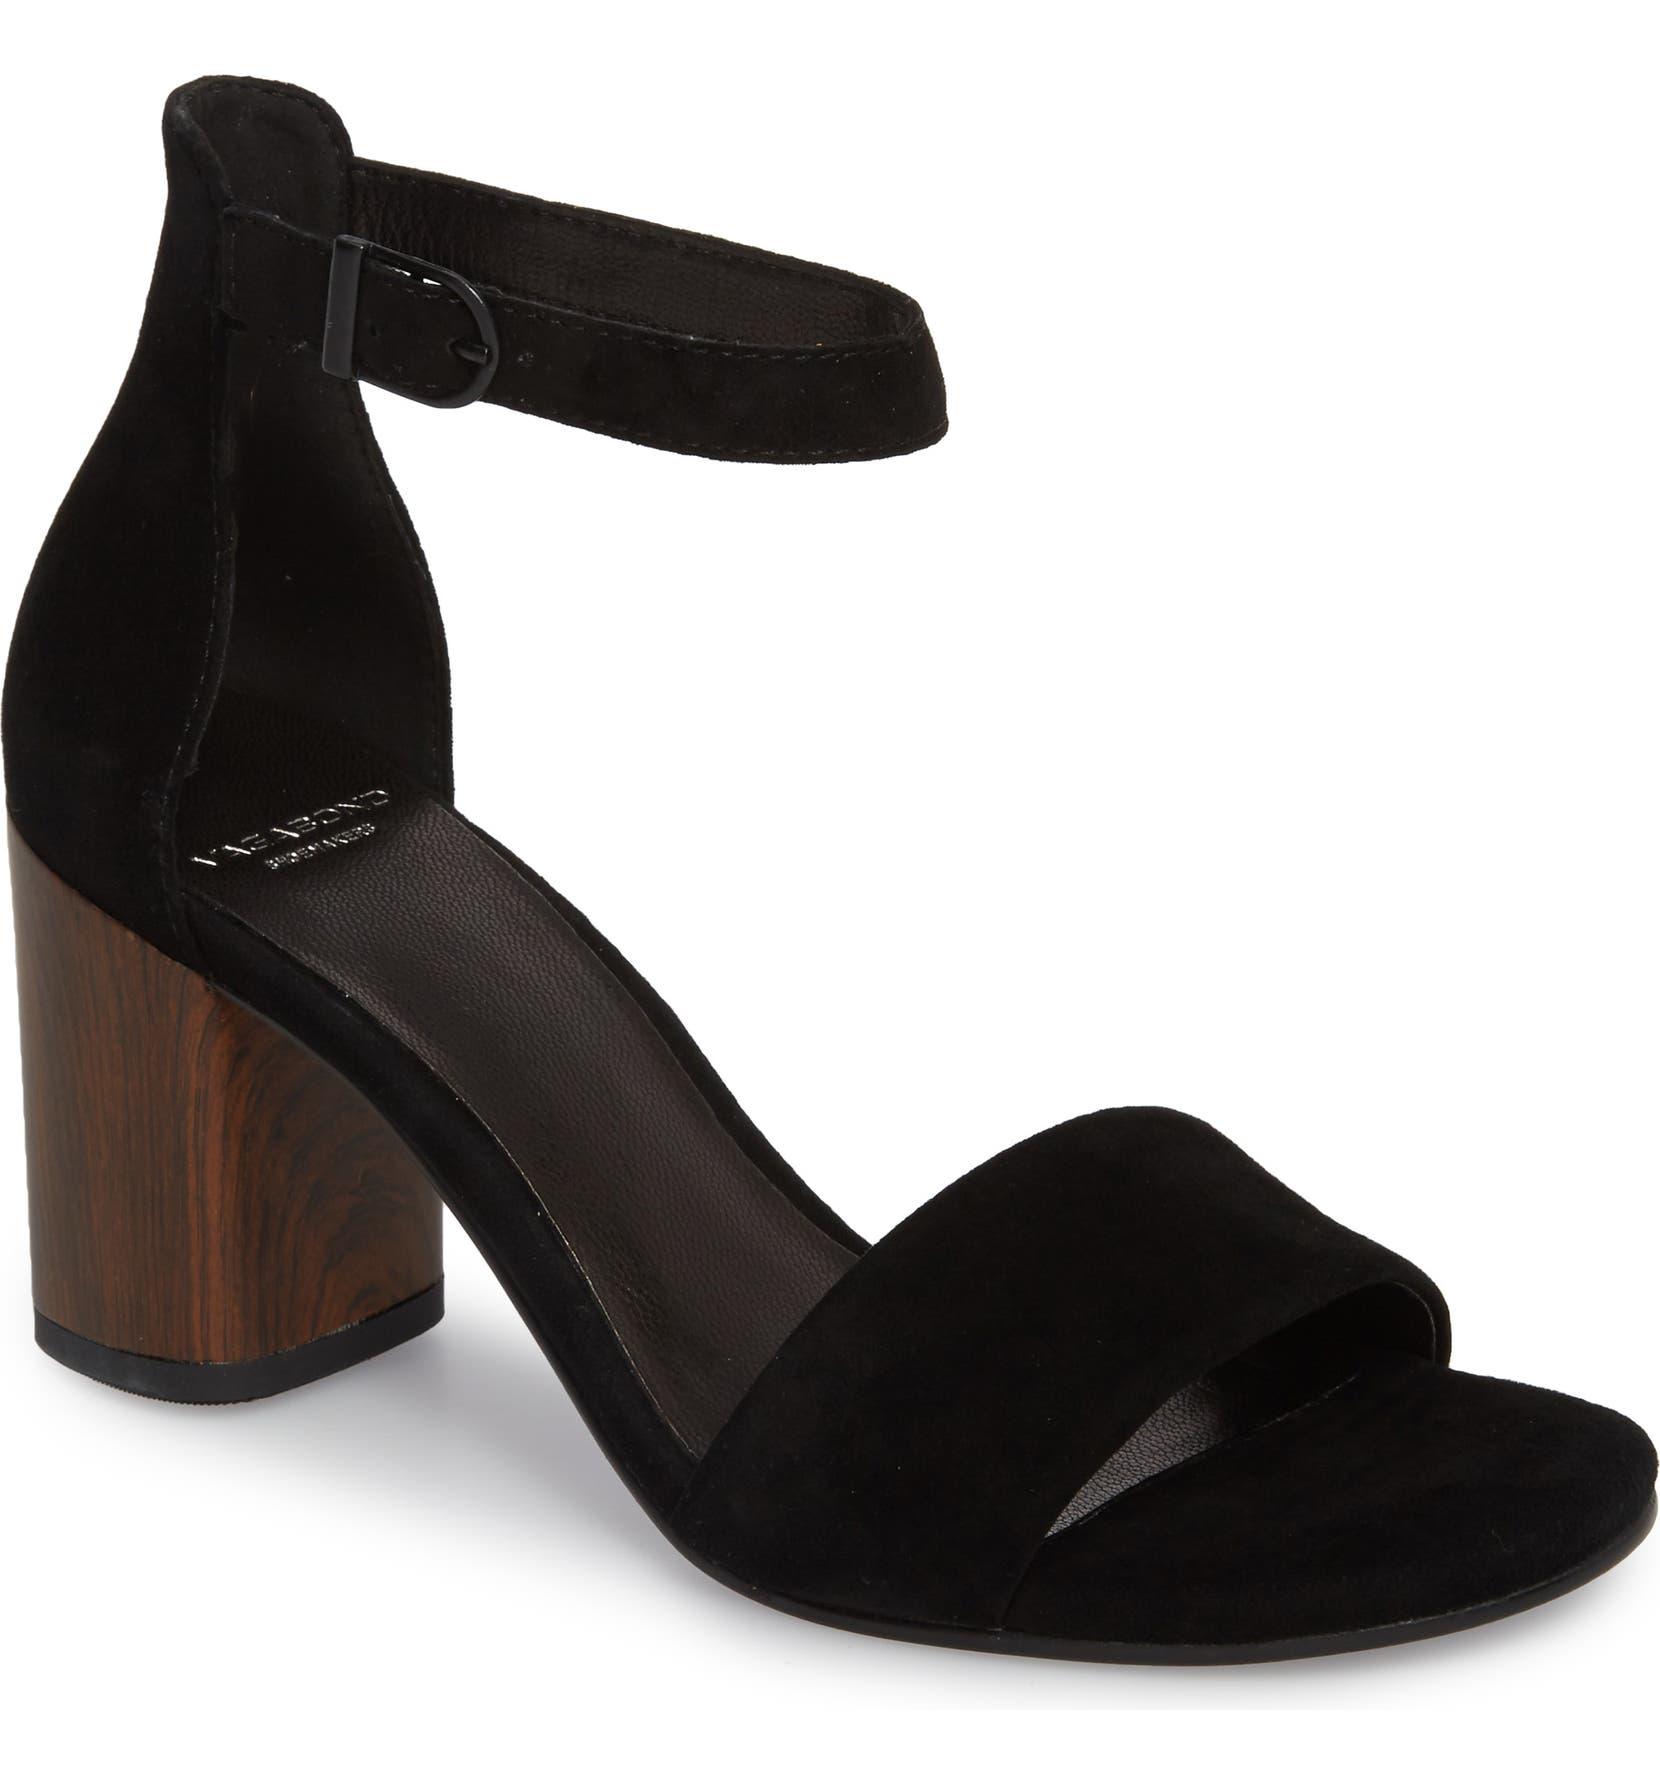 dac568a90ba Vagabond Shoemakers Carol Ankle Strap Sandal (Women) | Nordstrom